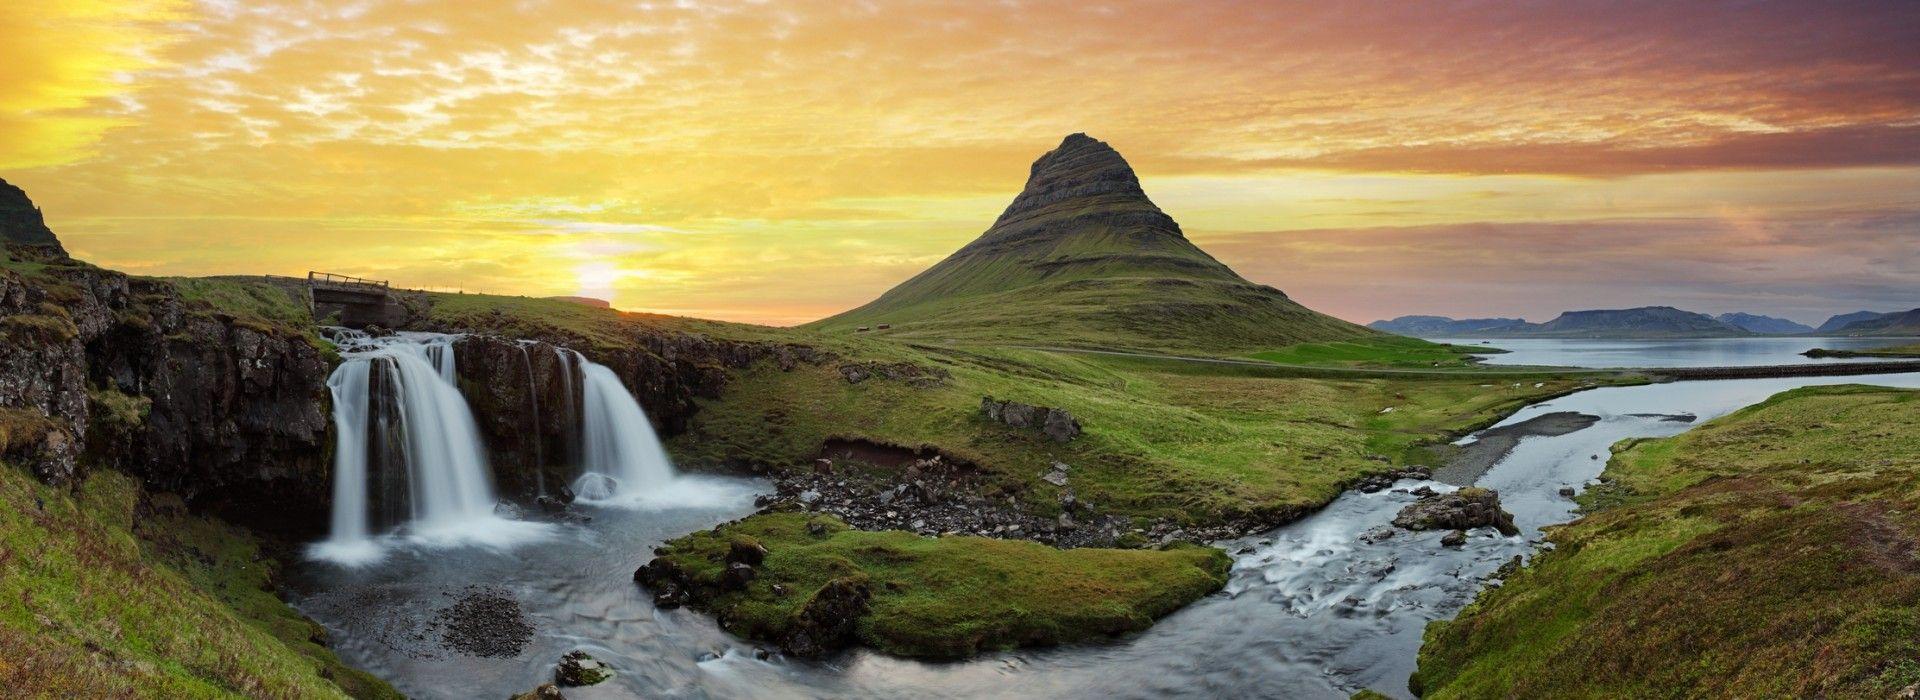 Wildlife, landscapes and nature Tours in Hvolsvollur